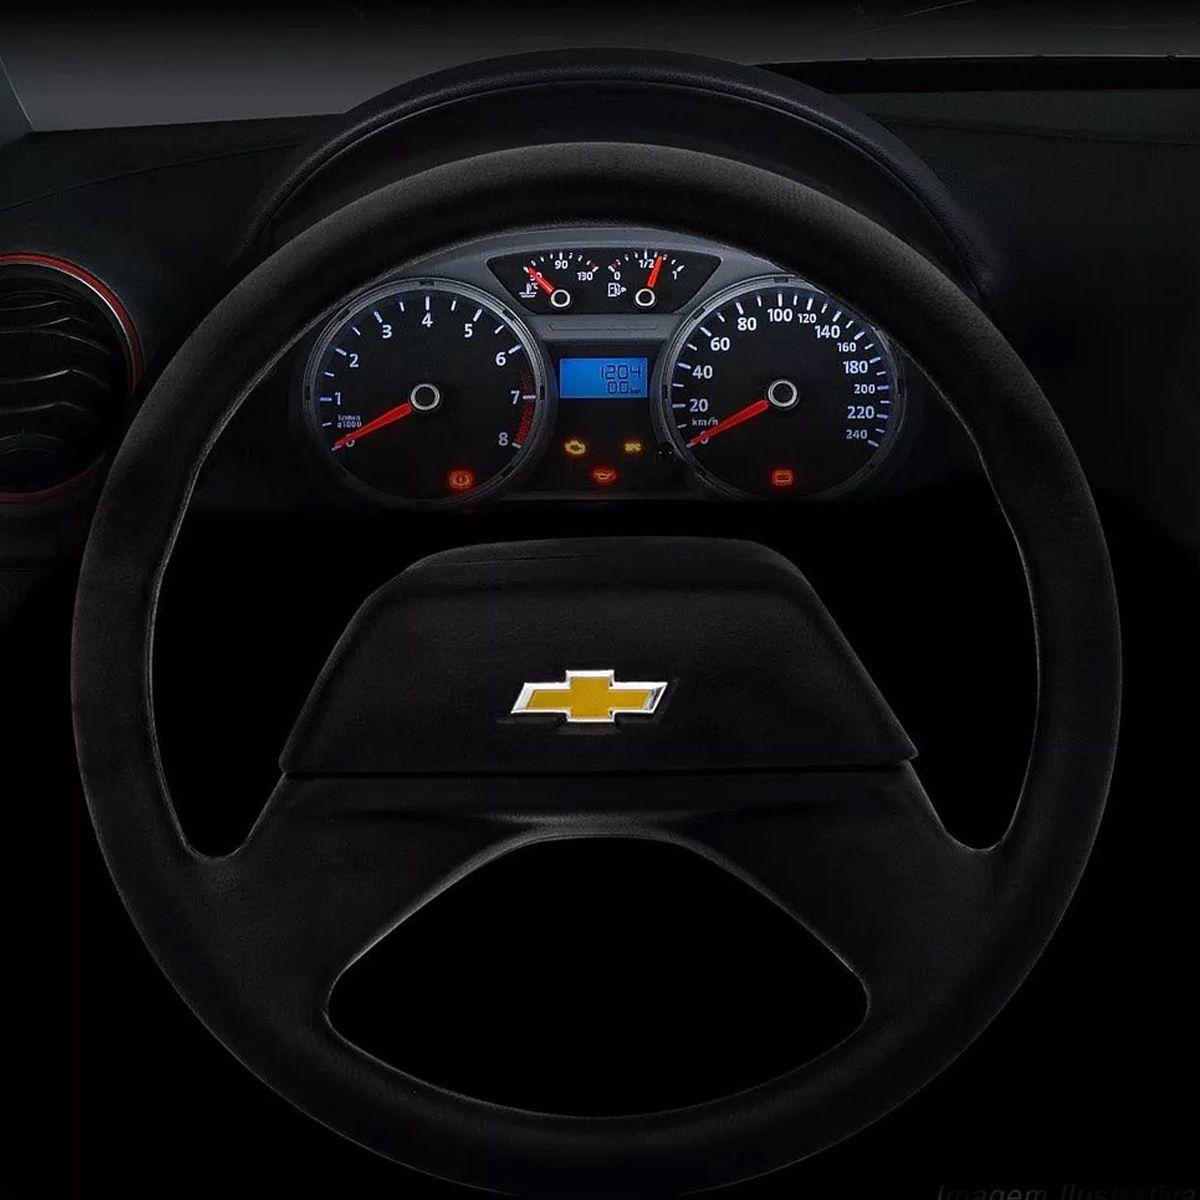 Volante Original D20 1993 1994 1995 1996 1997 1998 1999 Chevrolet Tampa Acionador de Buzina + Cubo Gm